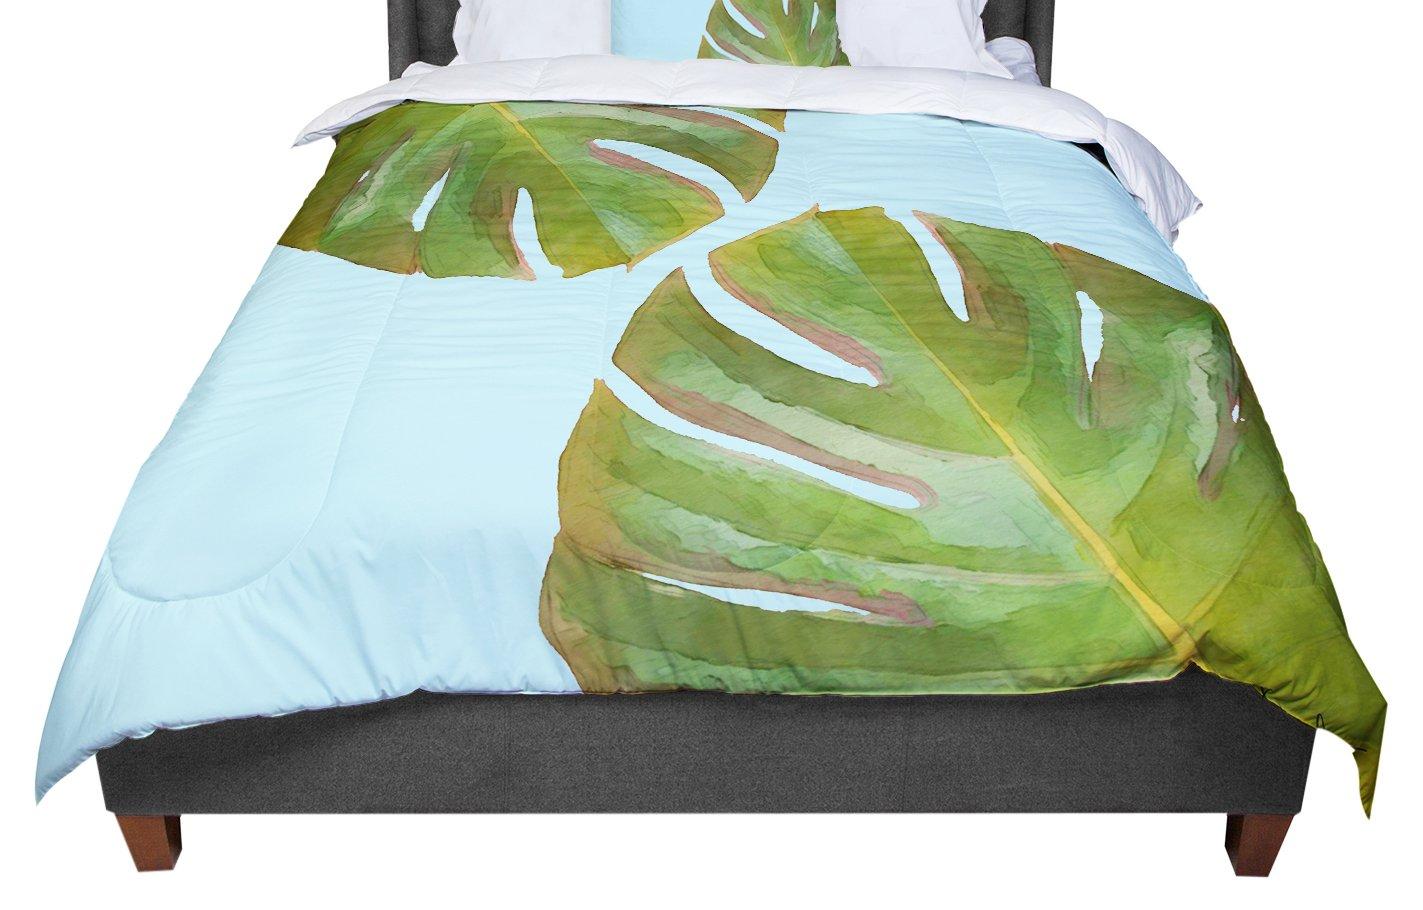 KESS InHouse Ingrid Beddoes Bubblicious Green Blue Twin Comforter 68 X 88